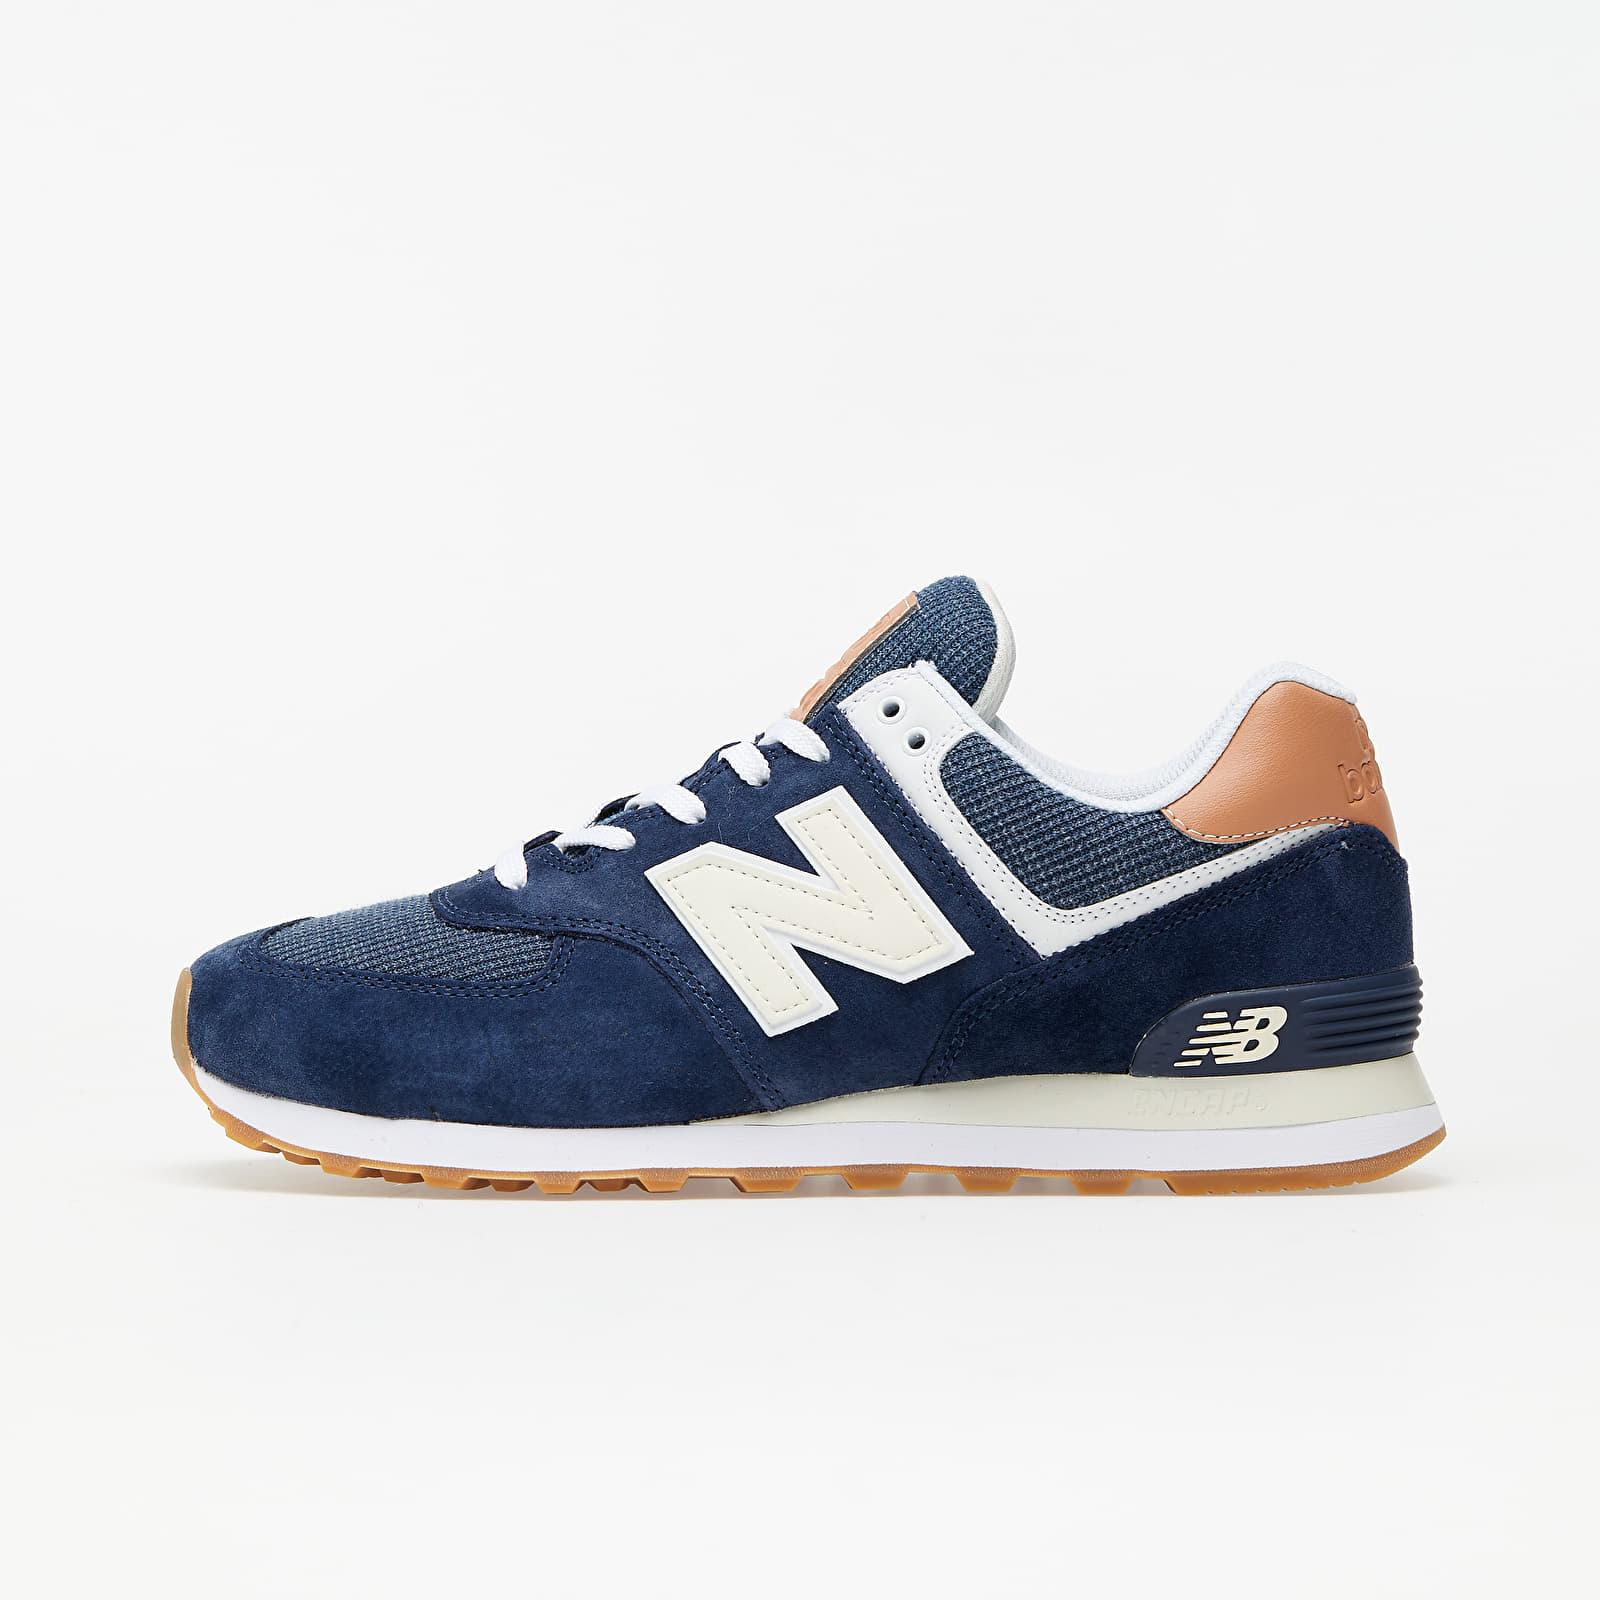 New Balance 574 Navy Blue/ Brown | Footshop